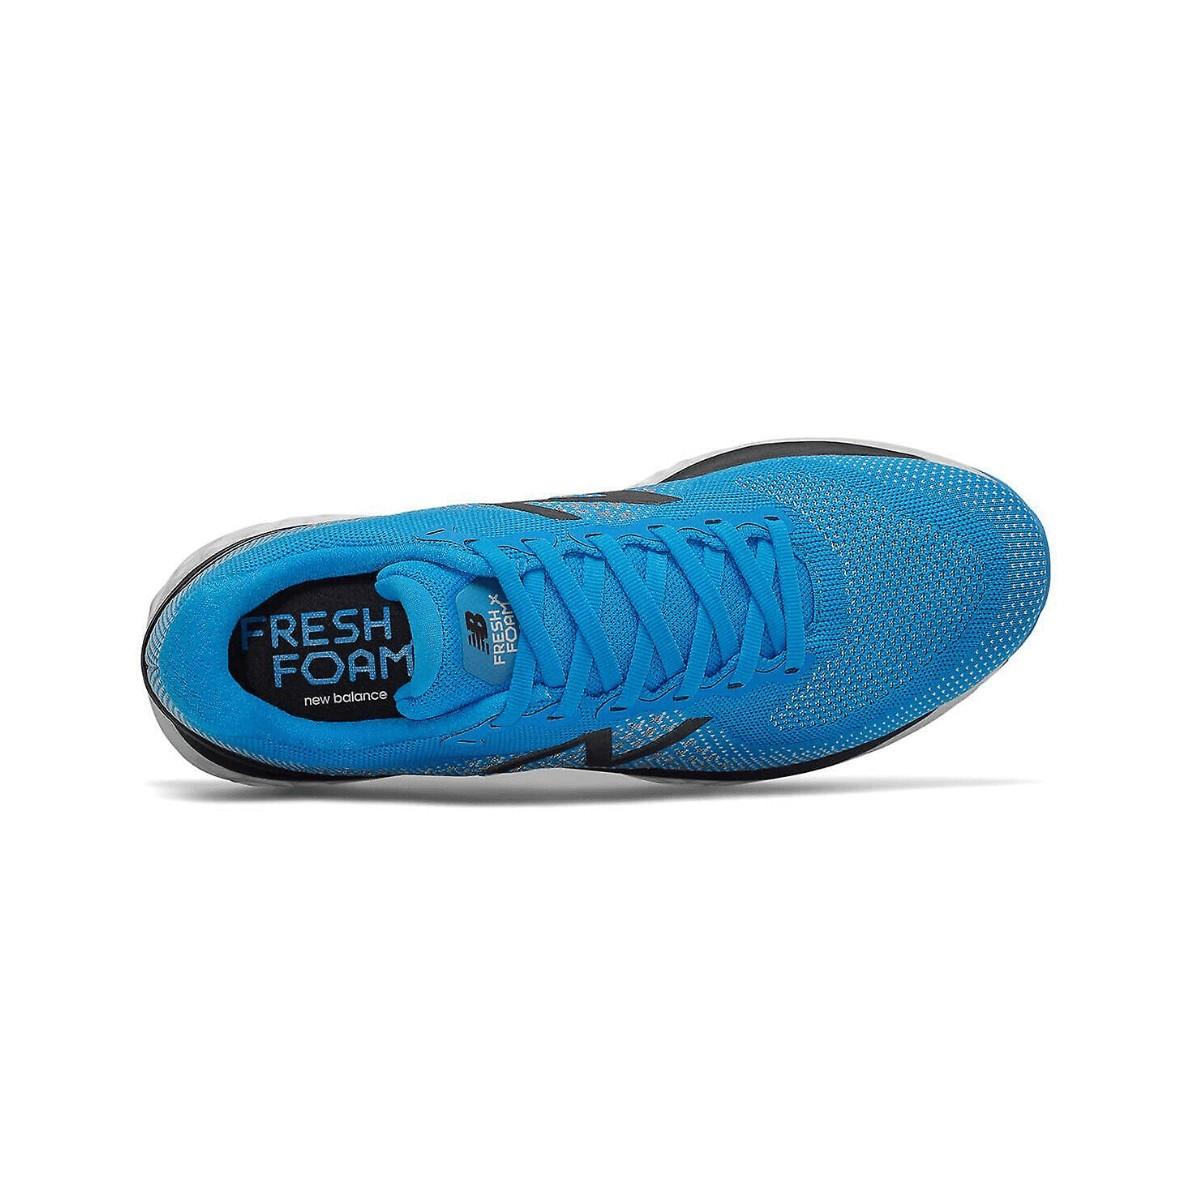 New Balance Fresh Foam 880 v10 Blue SS20 Men's Running Shoes